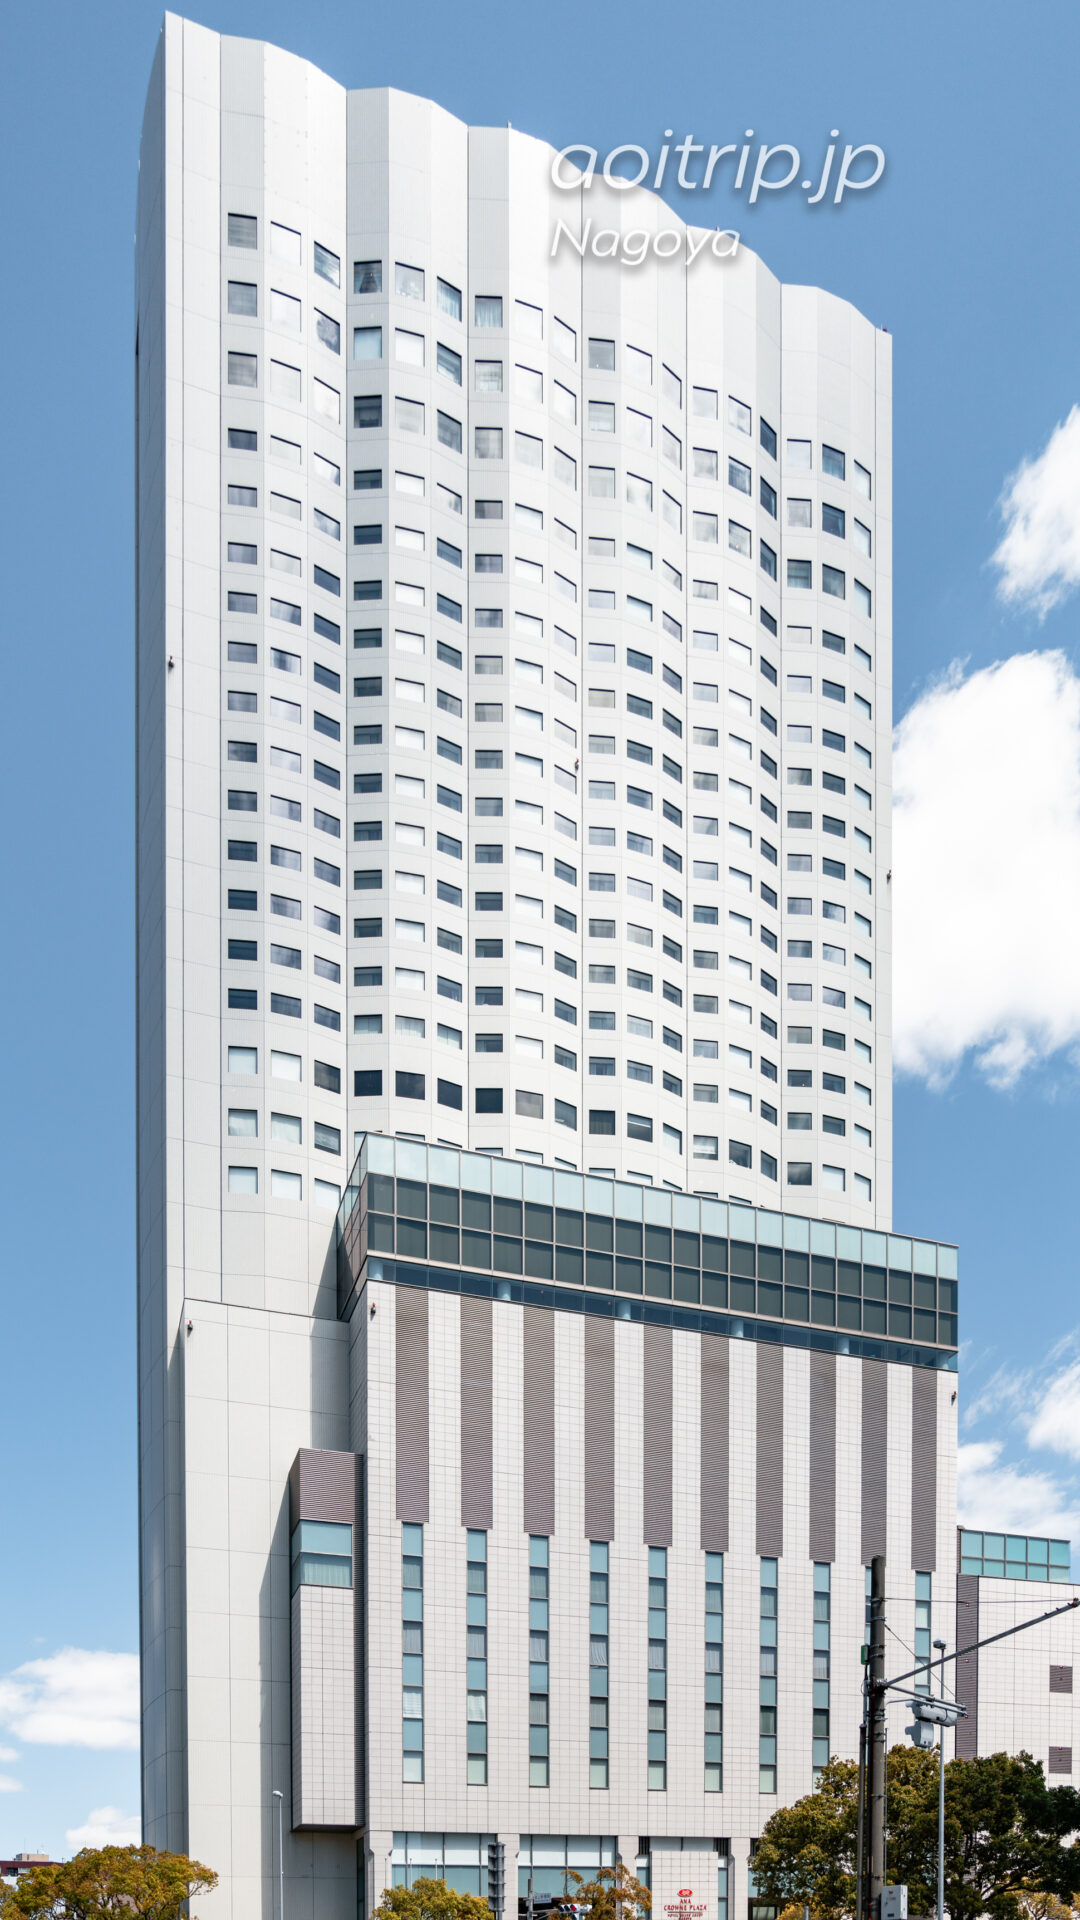 ANAクラウンプラザホテルグランコート名古屋 宿泊記|ANA Crowne Plaza Hotel Grand Court Nagoya